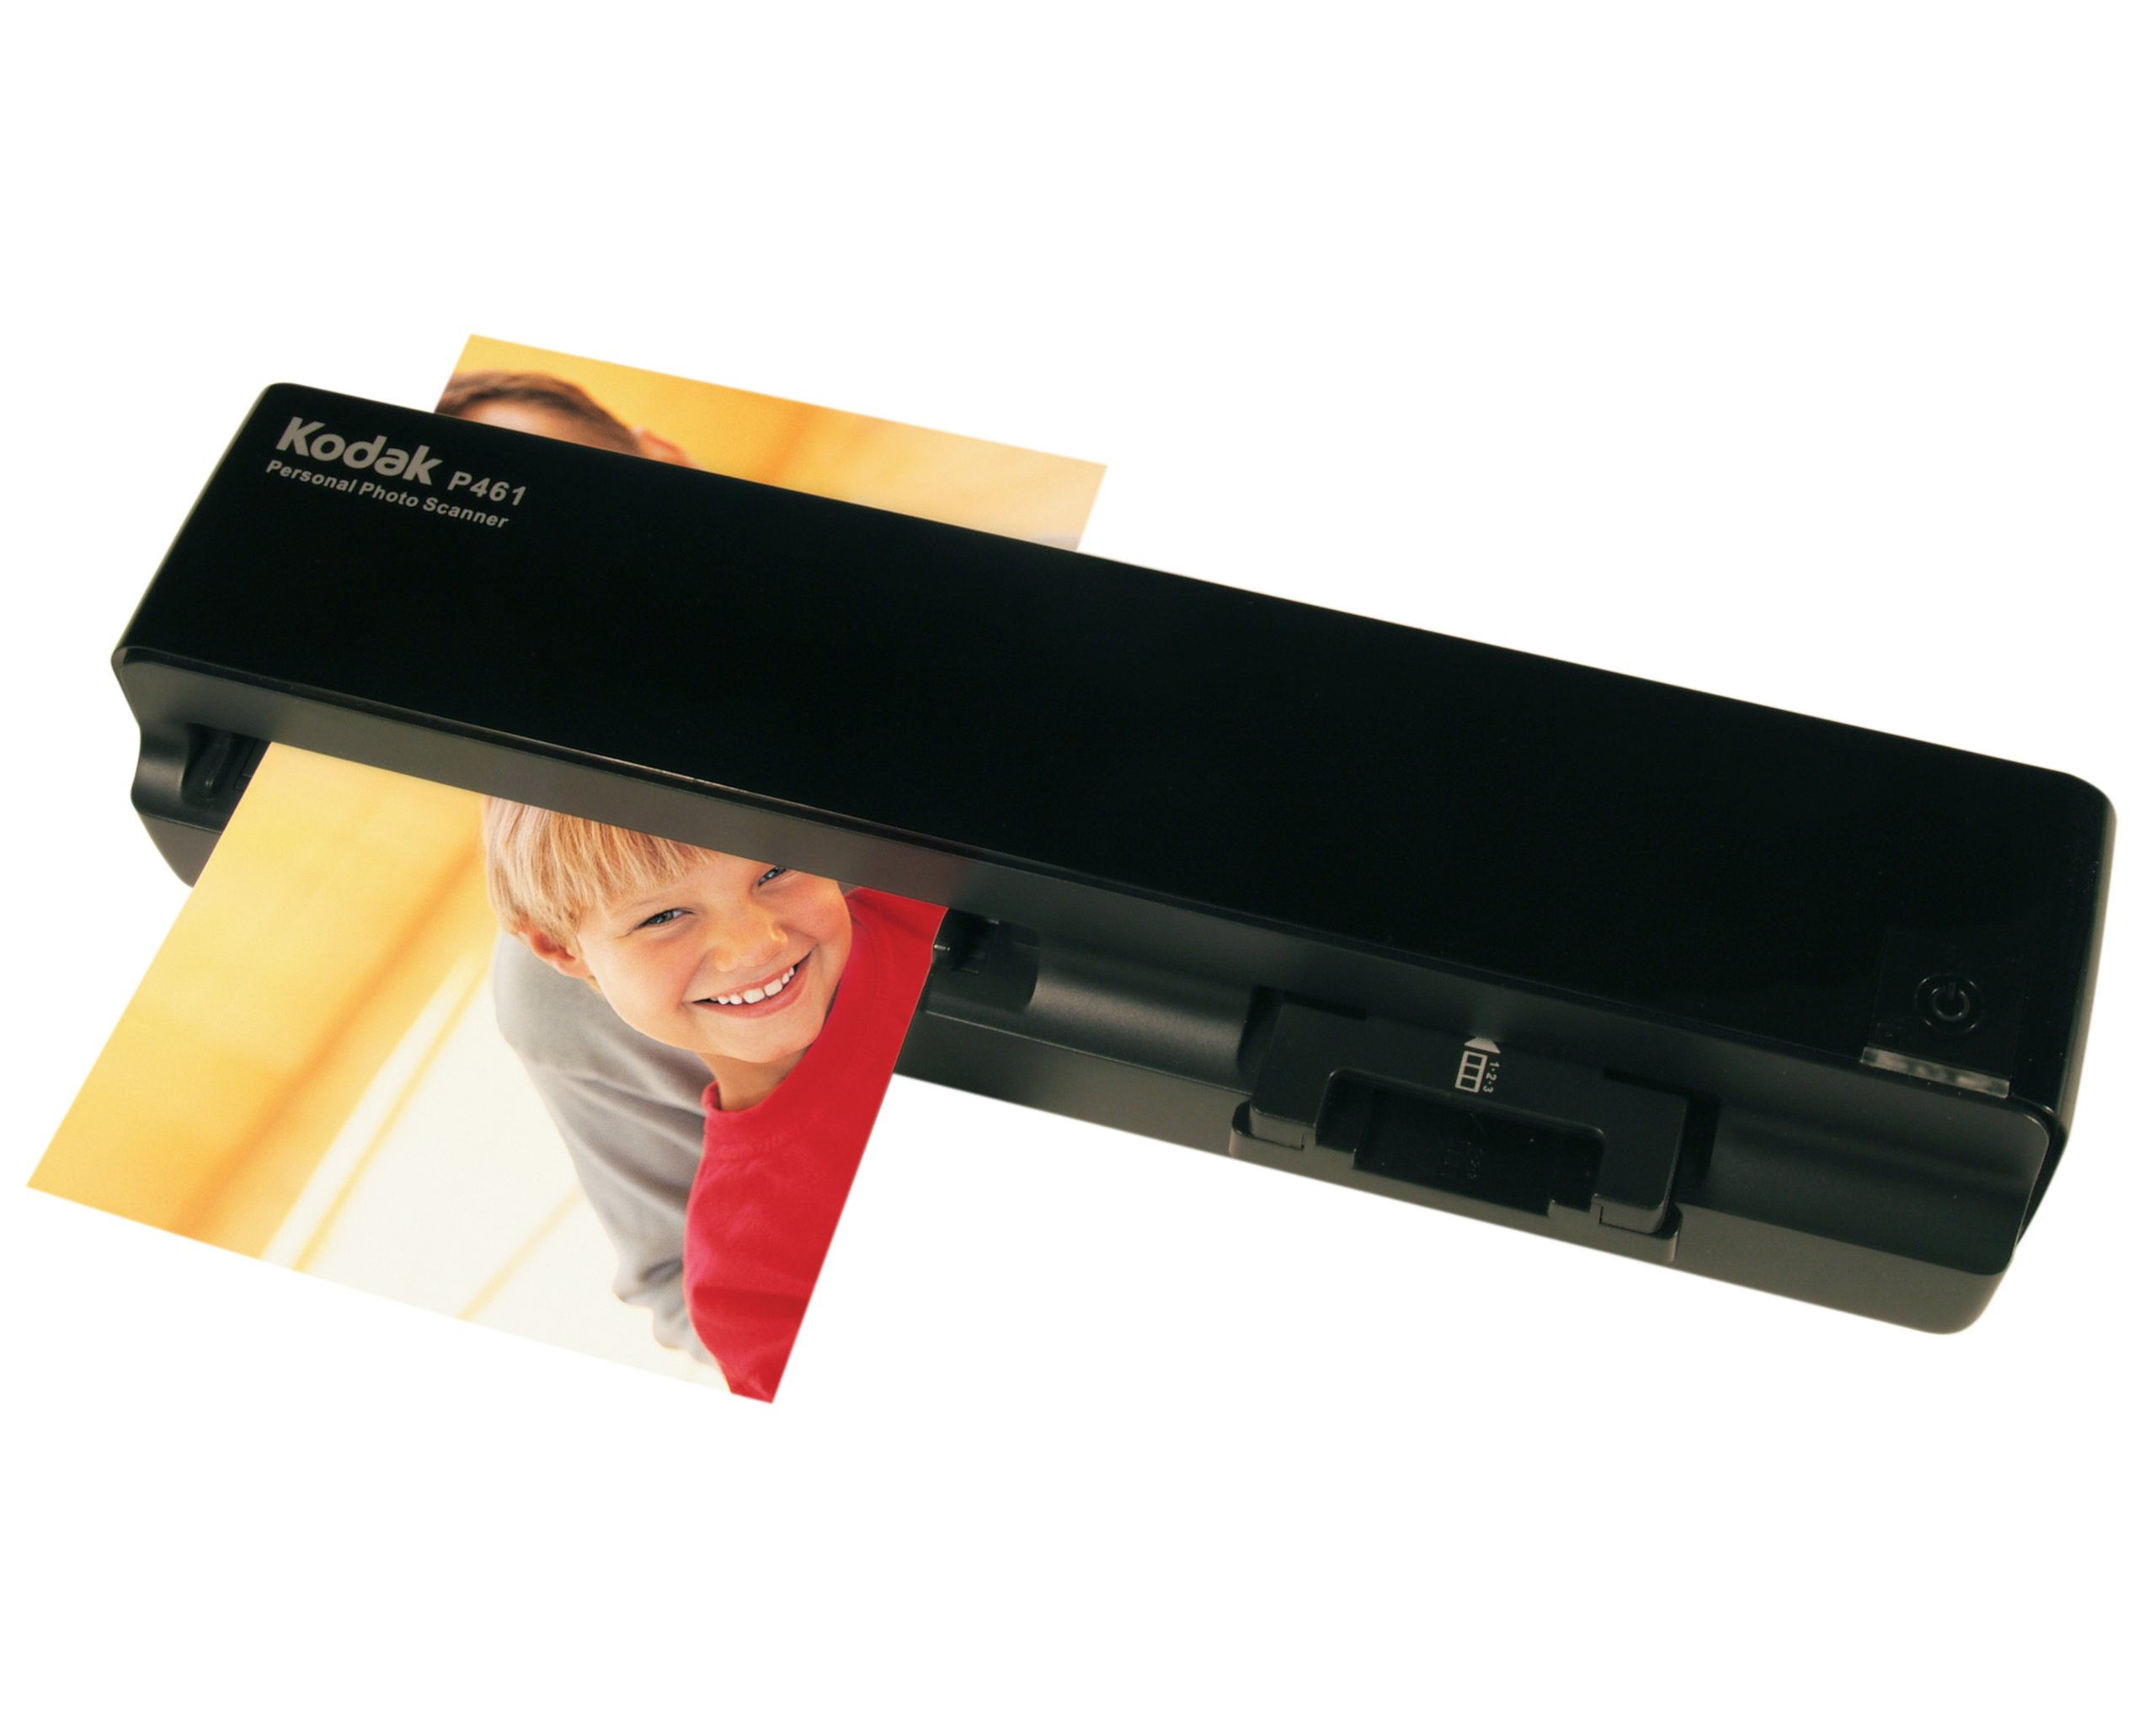 Kodak 4x6 P461 Personal Photo, Slide and Negative Scanner